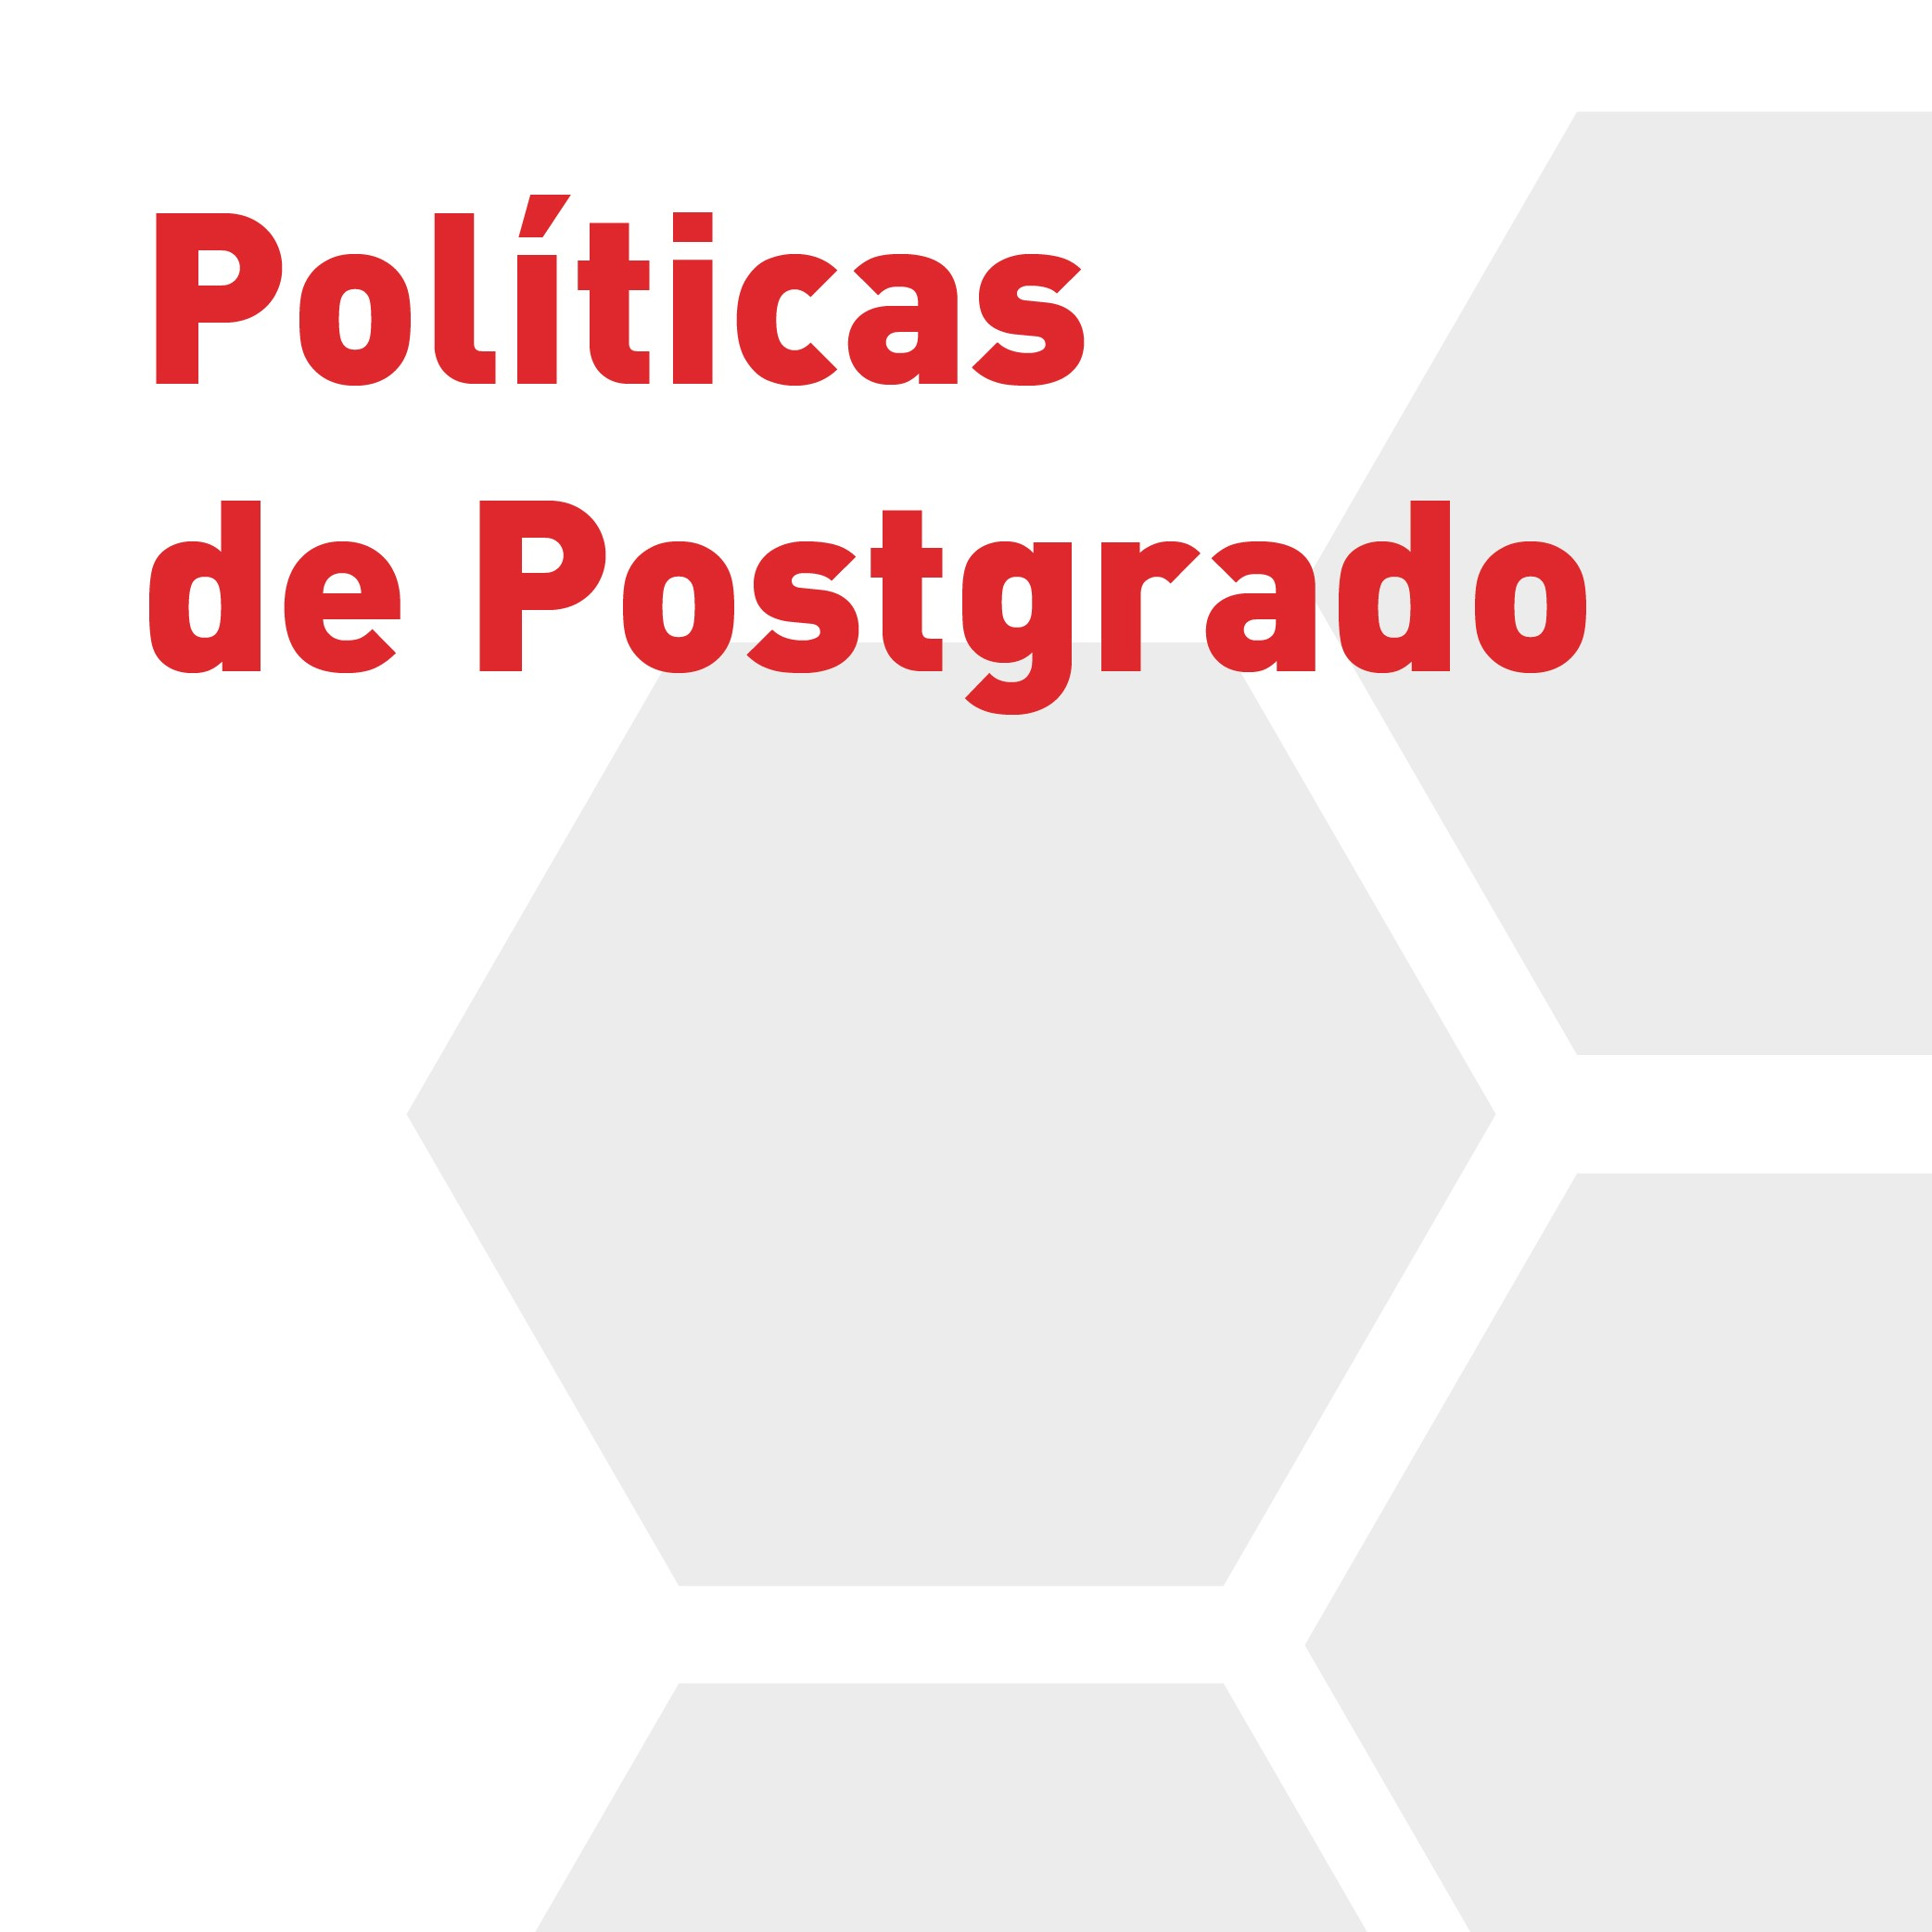 Postgraduate Policies